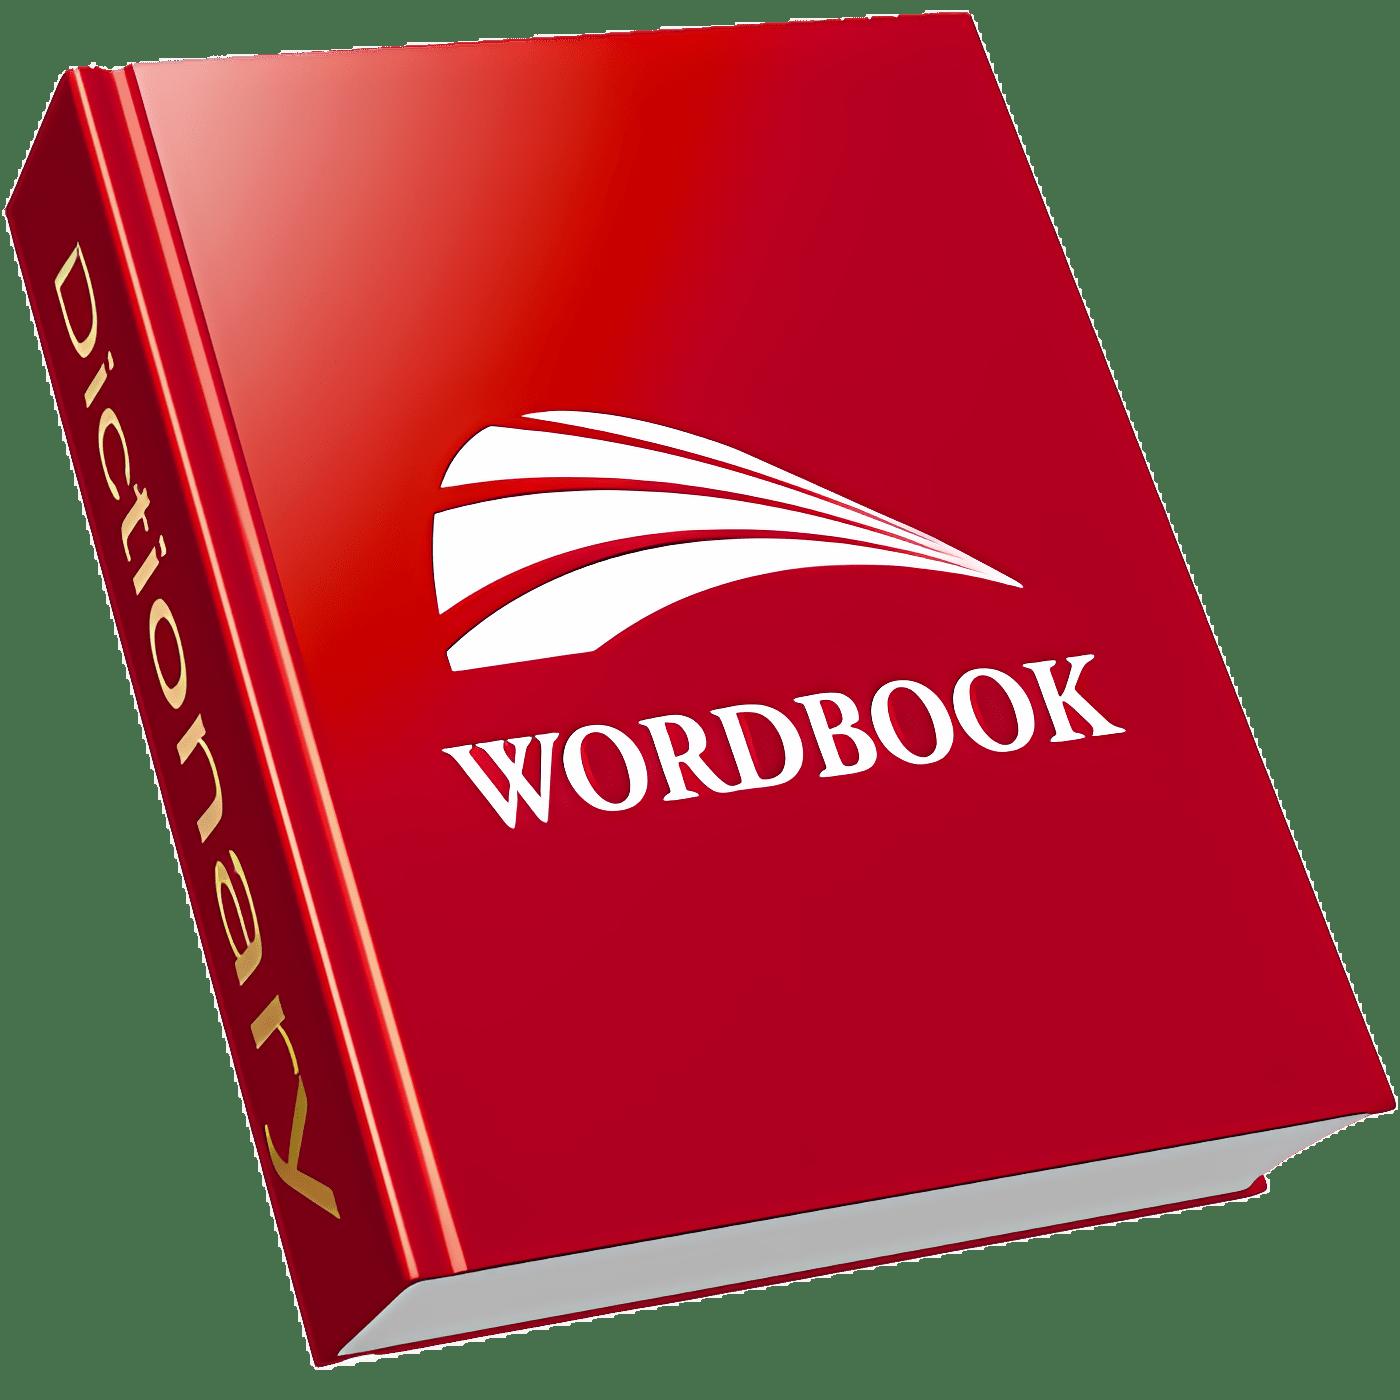 WordBook English Dictionary and Thesaurus